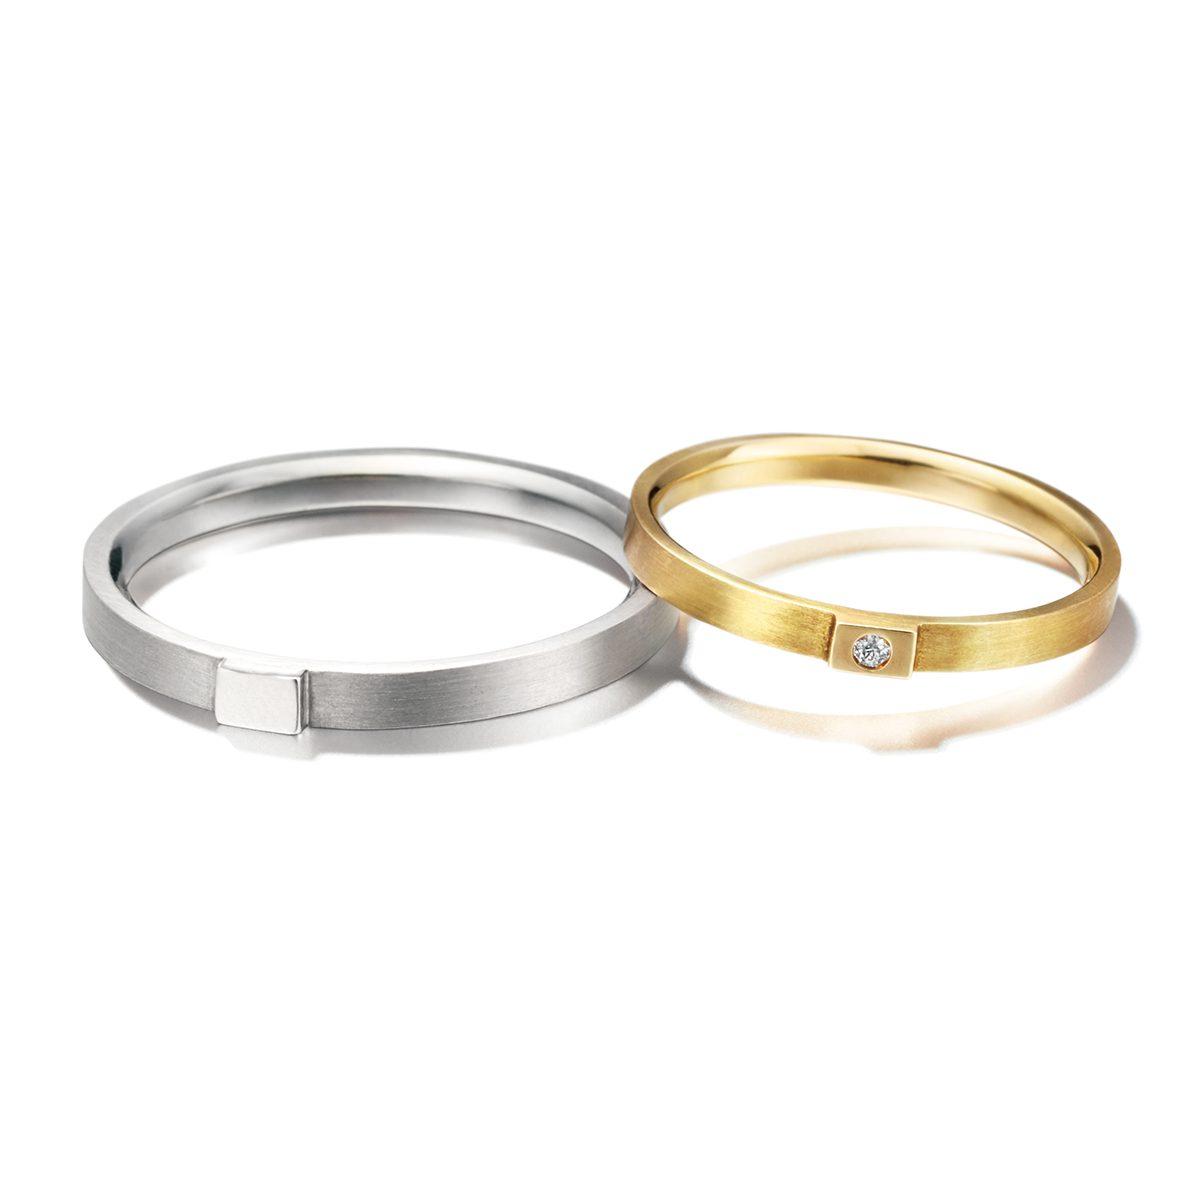 chigo - BEAUTIFUL LIFE Marriage Rings